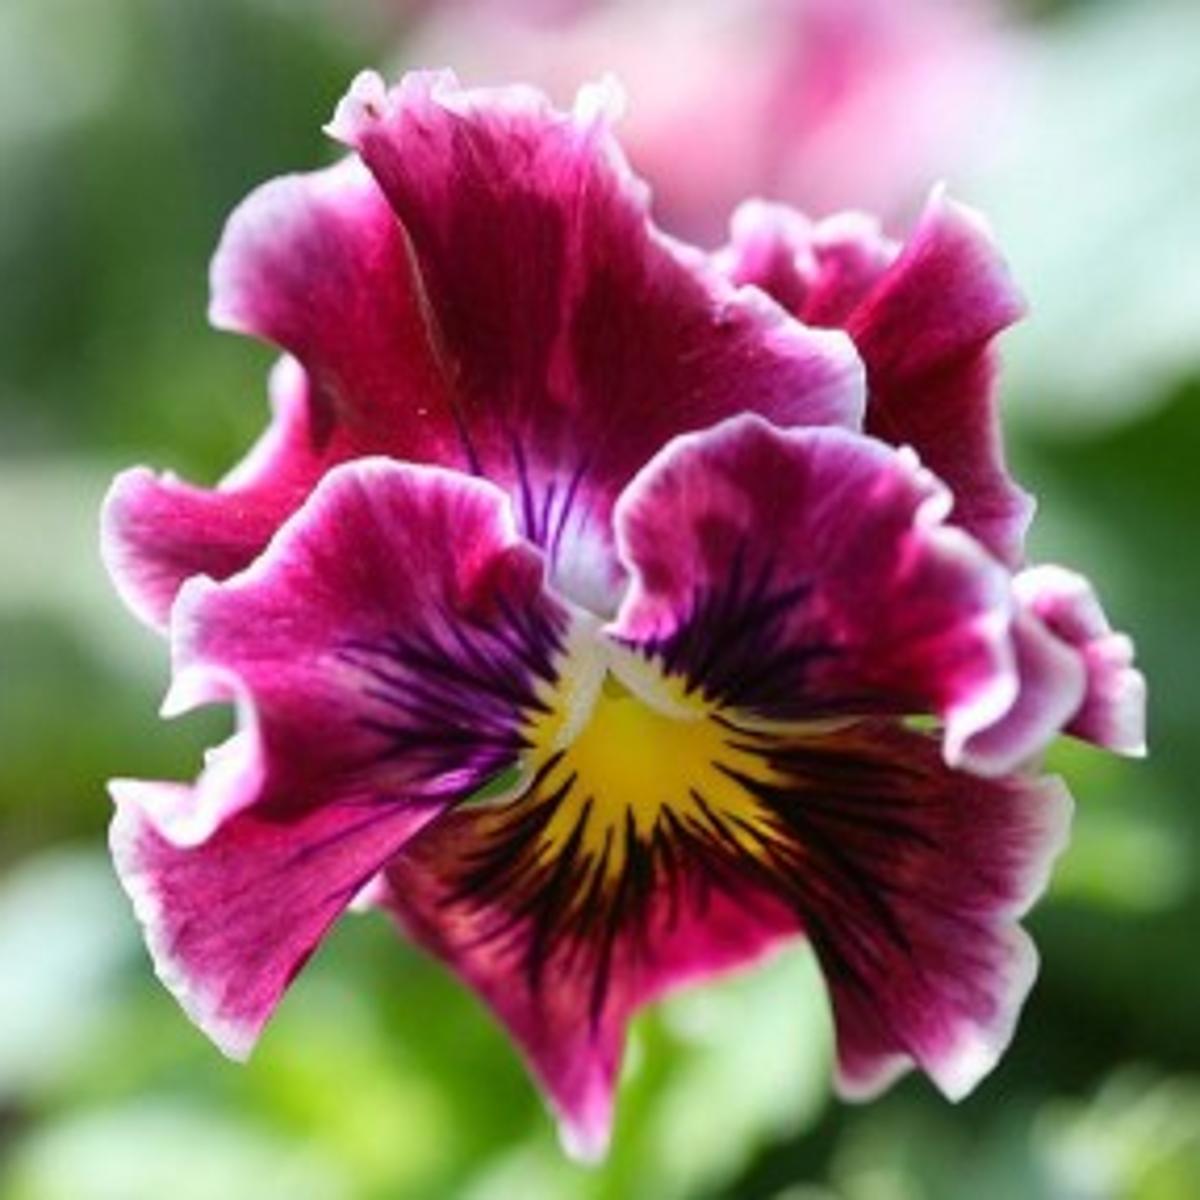 Pansies Tough Triple Threats Home And Garden Azdailysun Com